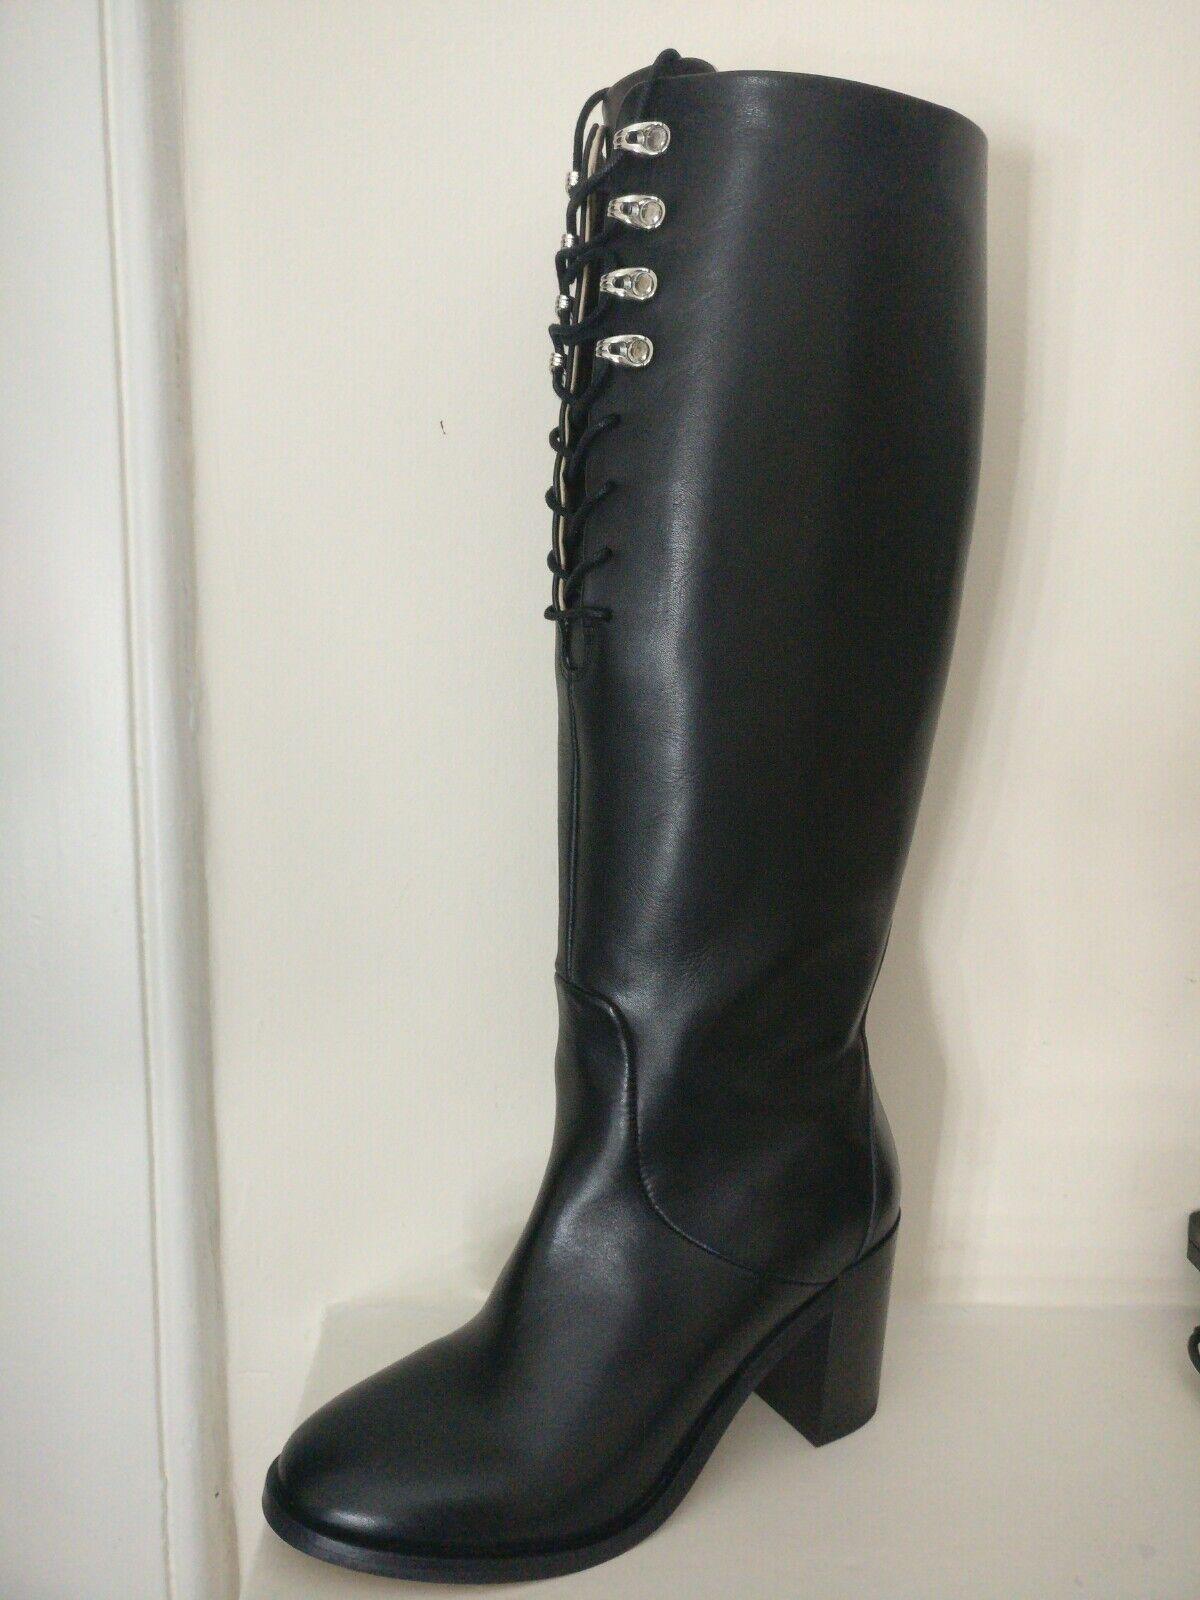 Diesel UK 6 D-Arlin Hook Knee High Boots Boots Boots EU 39 USA 8.5 Leather Block Heel Laces 3766e0